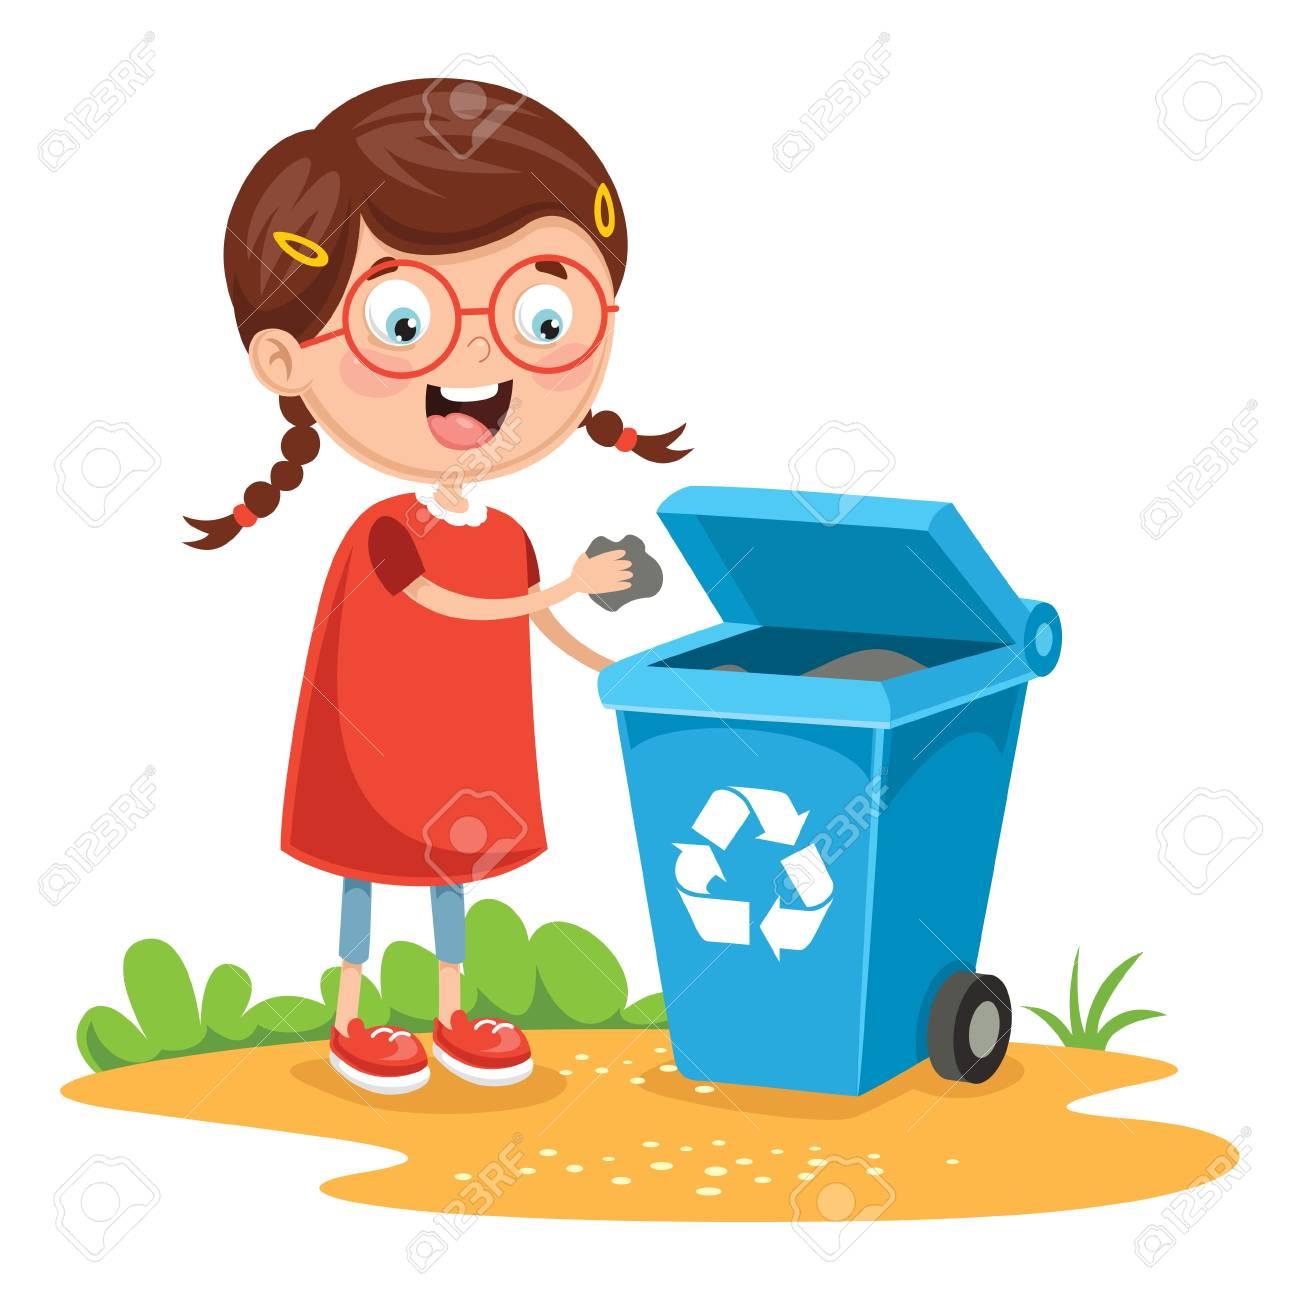 Vector Illustration Of Kid Recycling Trash - 103837422